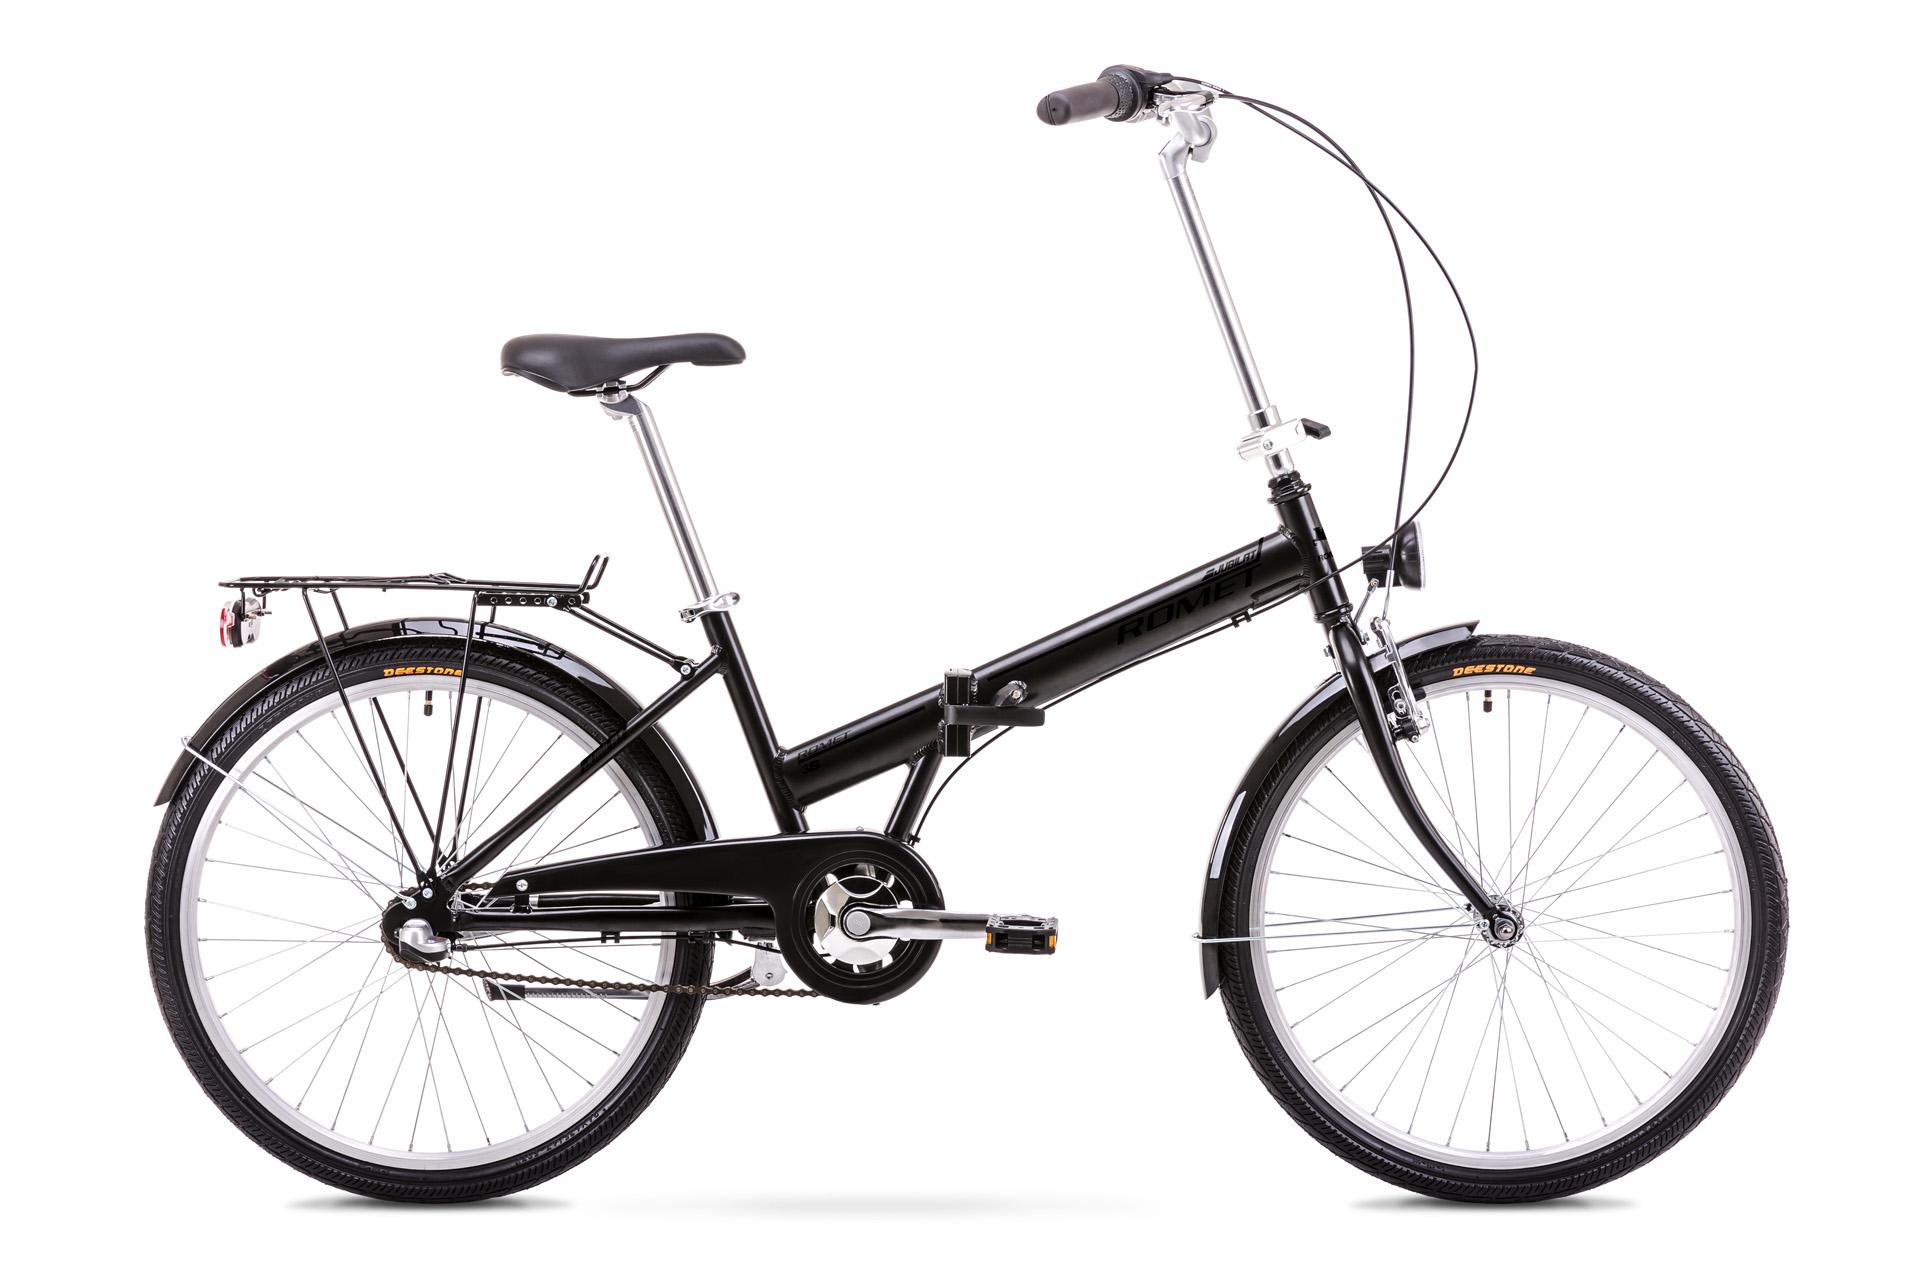 Bicicleta pliabila Unisex Romet Jubilat 3 Negru 2019 imagine